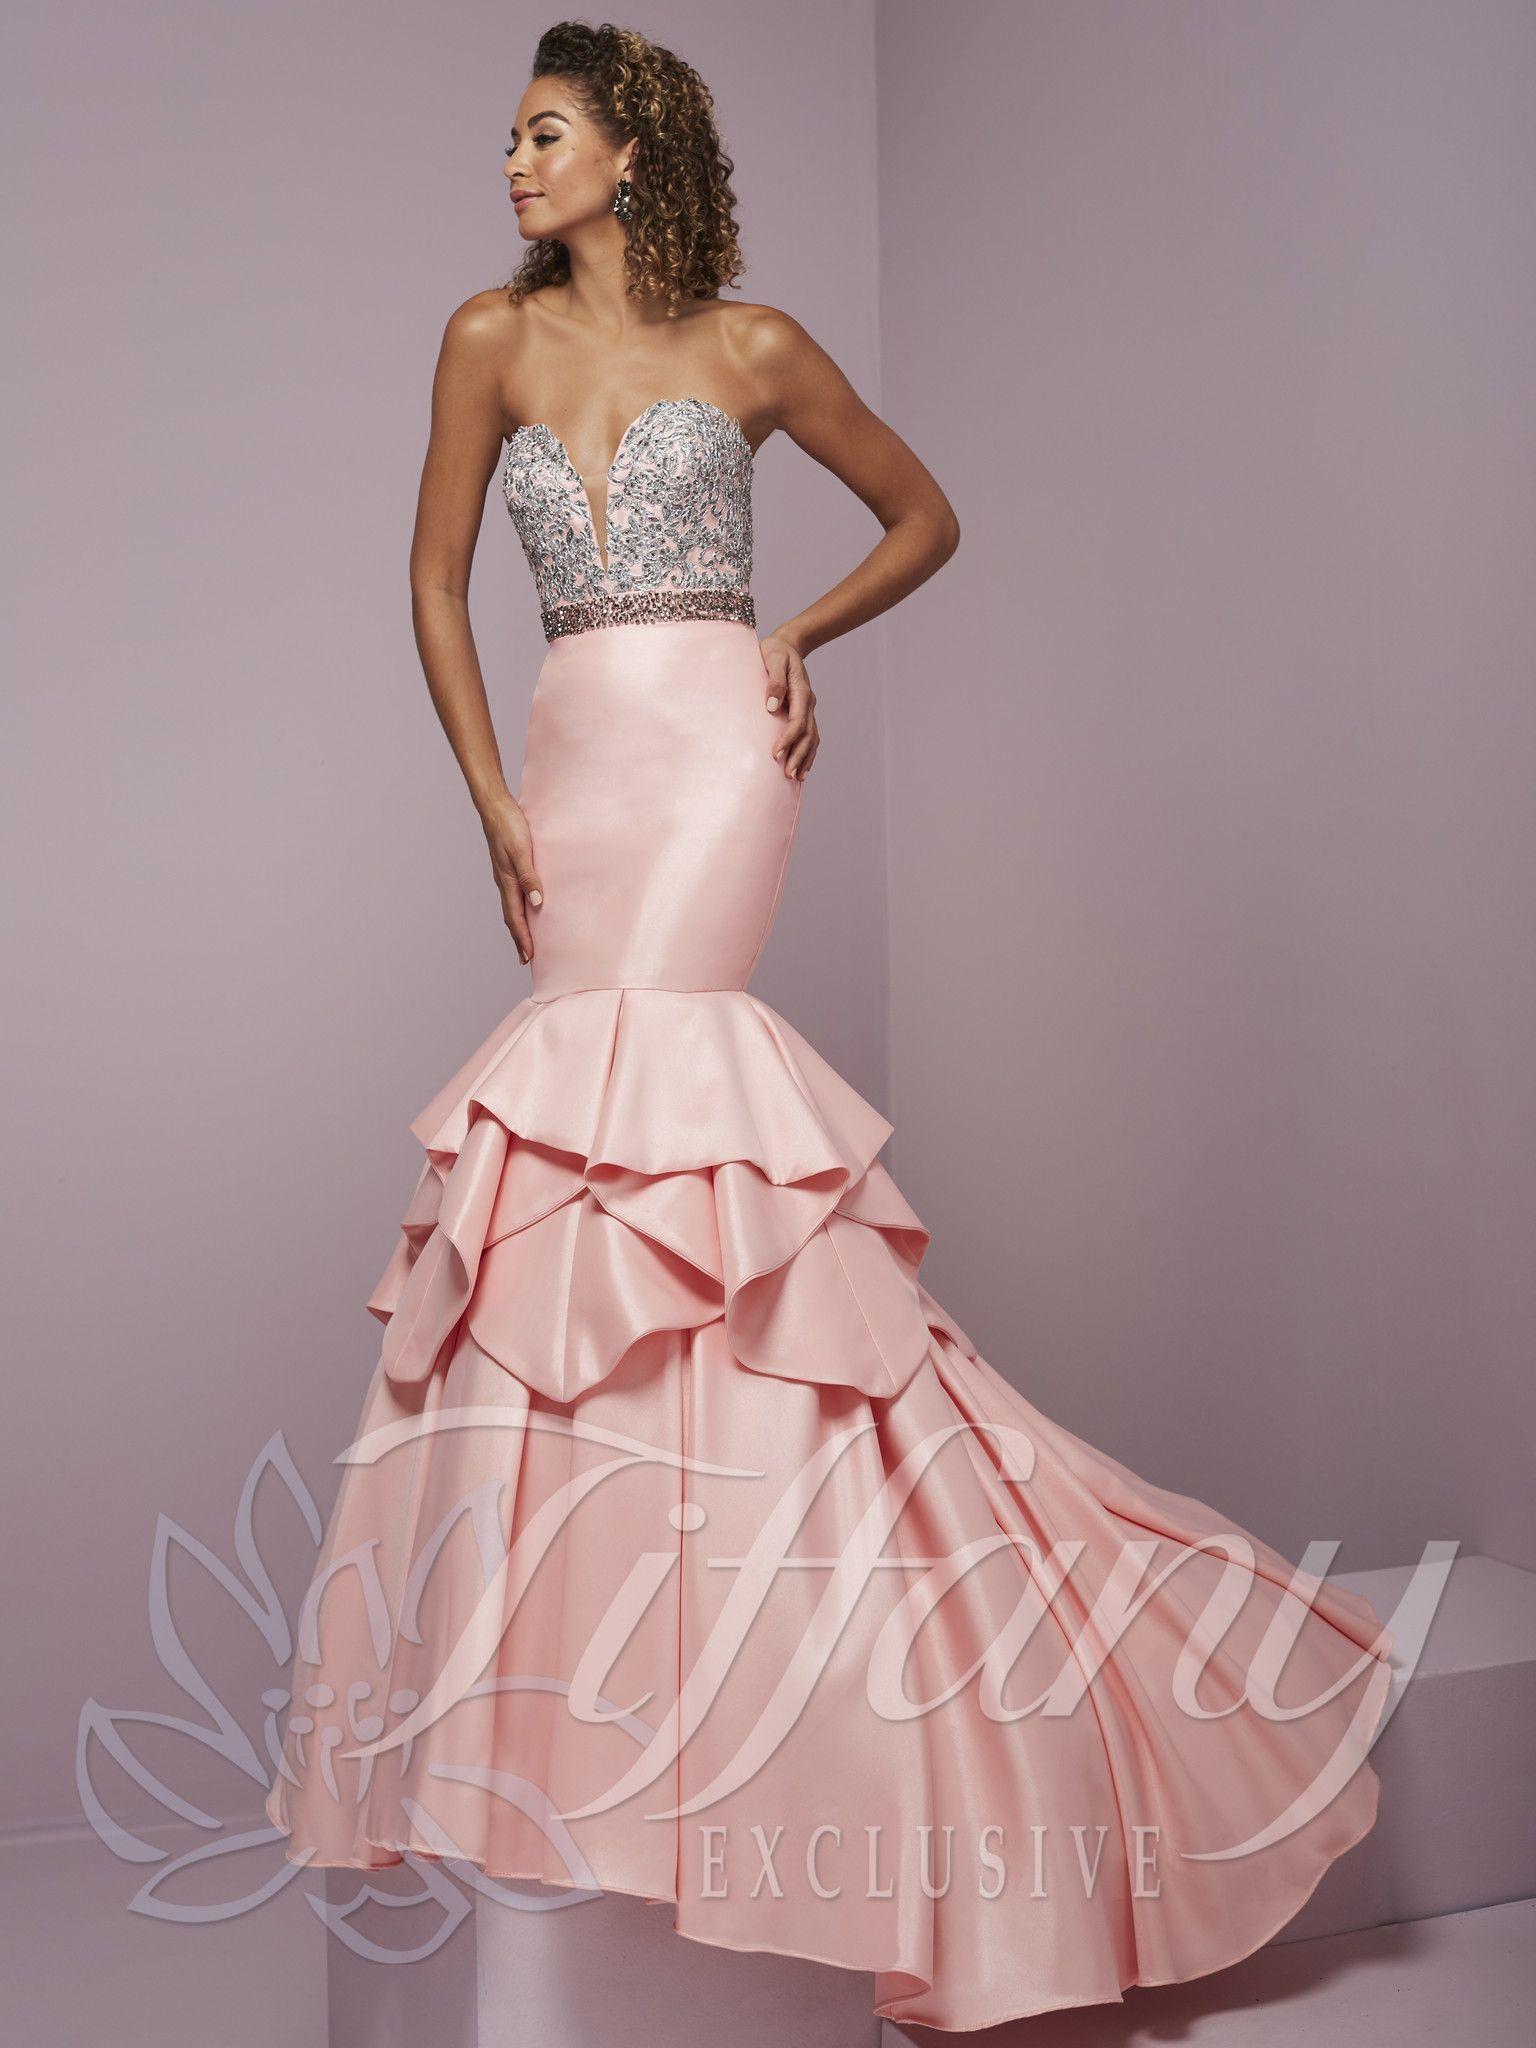 Tiffany Exclusives 46079 Pink Deep Sweetheart Mermaid Prom Dress ...